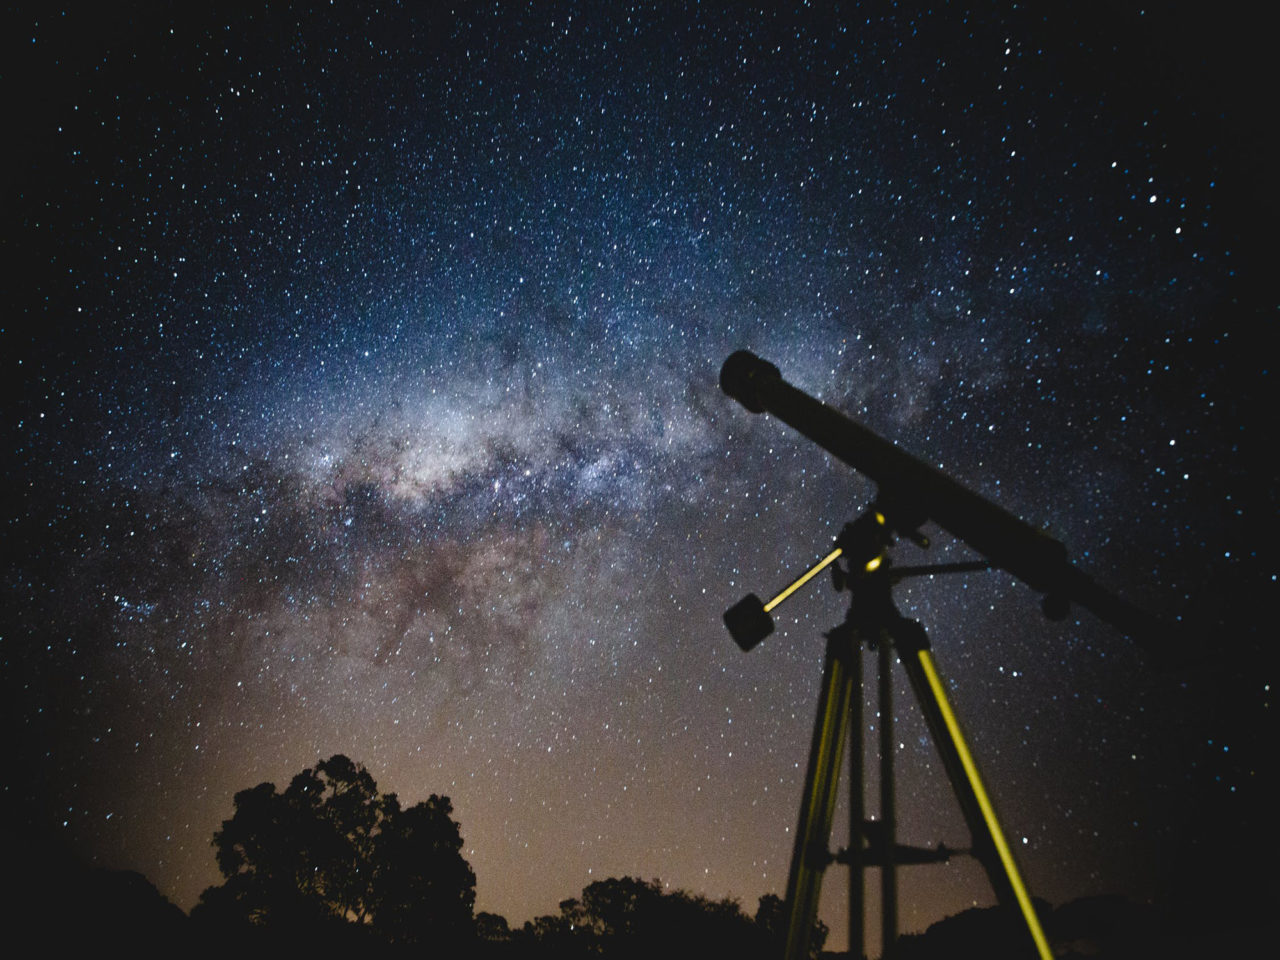 https://primeastrology.com/wp-content/uploads/2019/11/05.-Astrology-vs-science1-1-1280x960.jpg